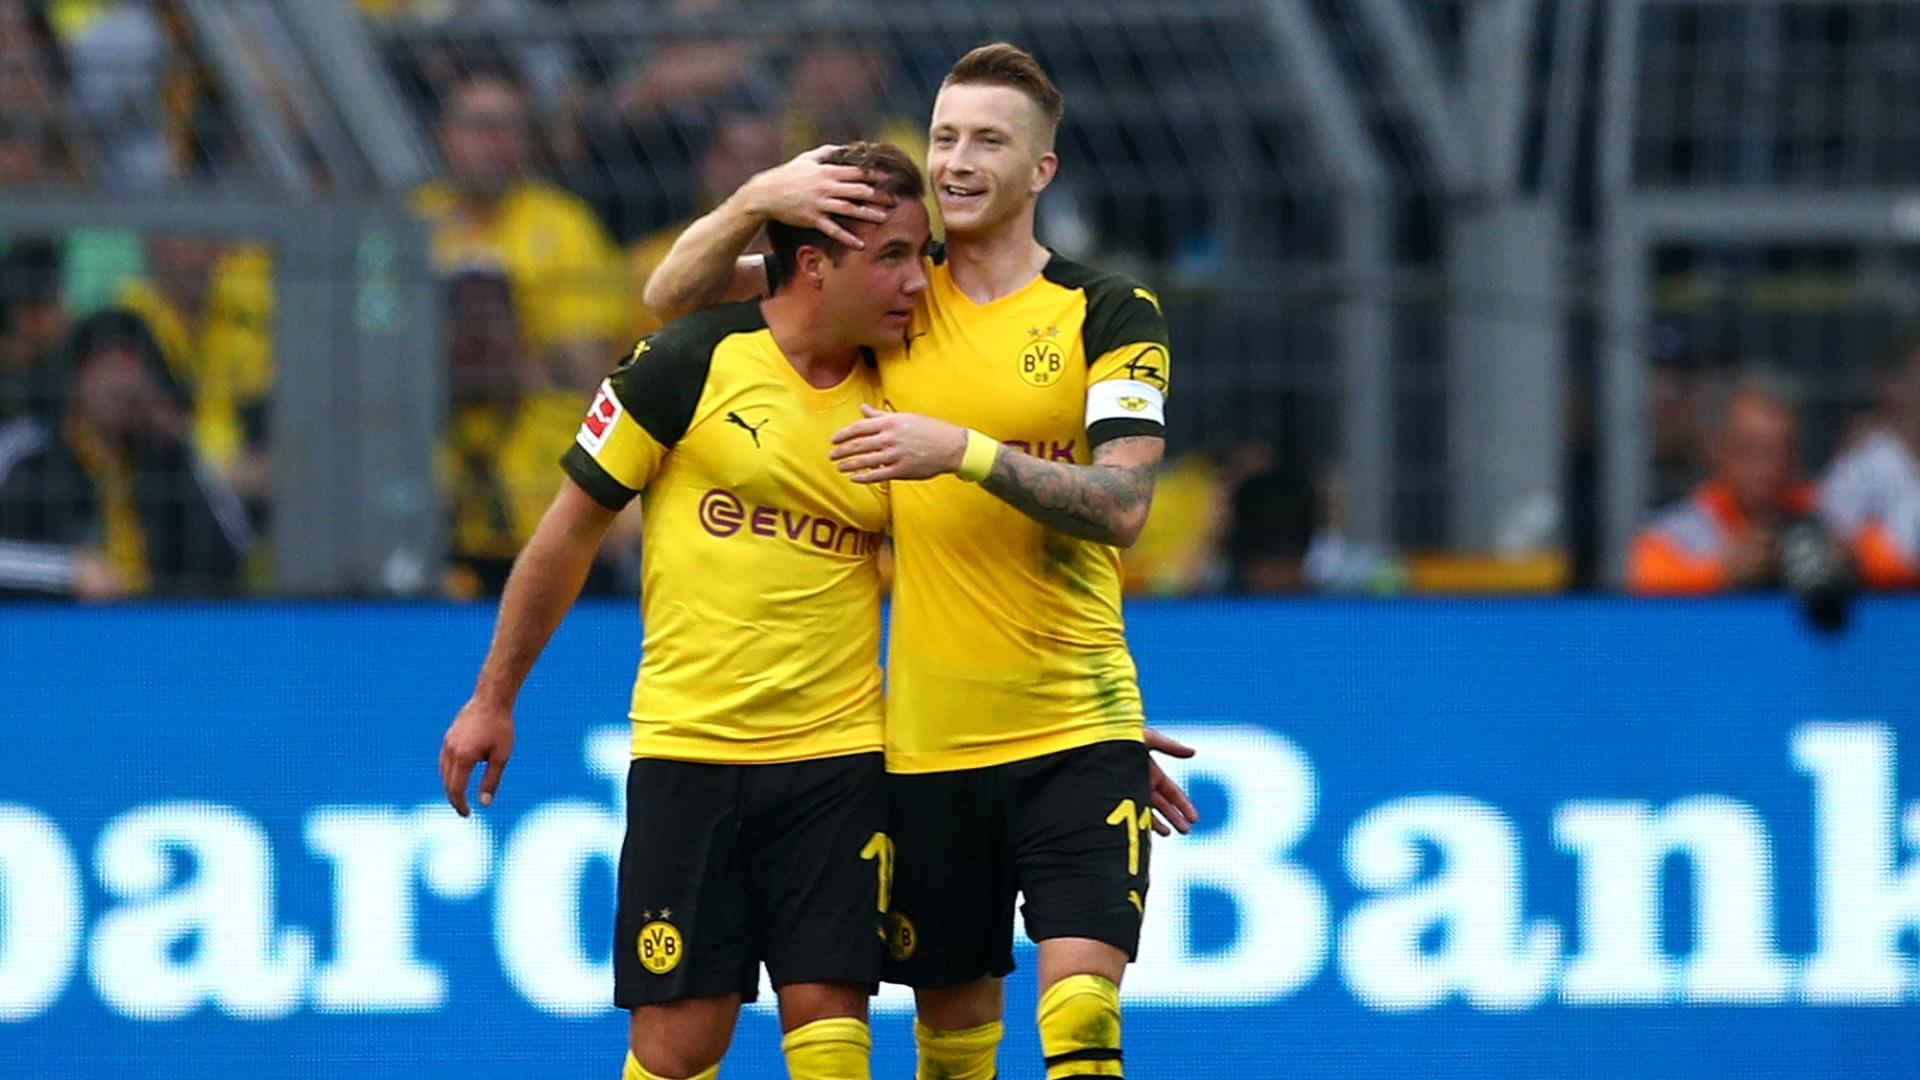 Mario Gotze Marco Reus Borussia Dortmund 2018-10-06